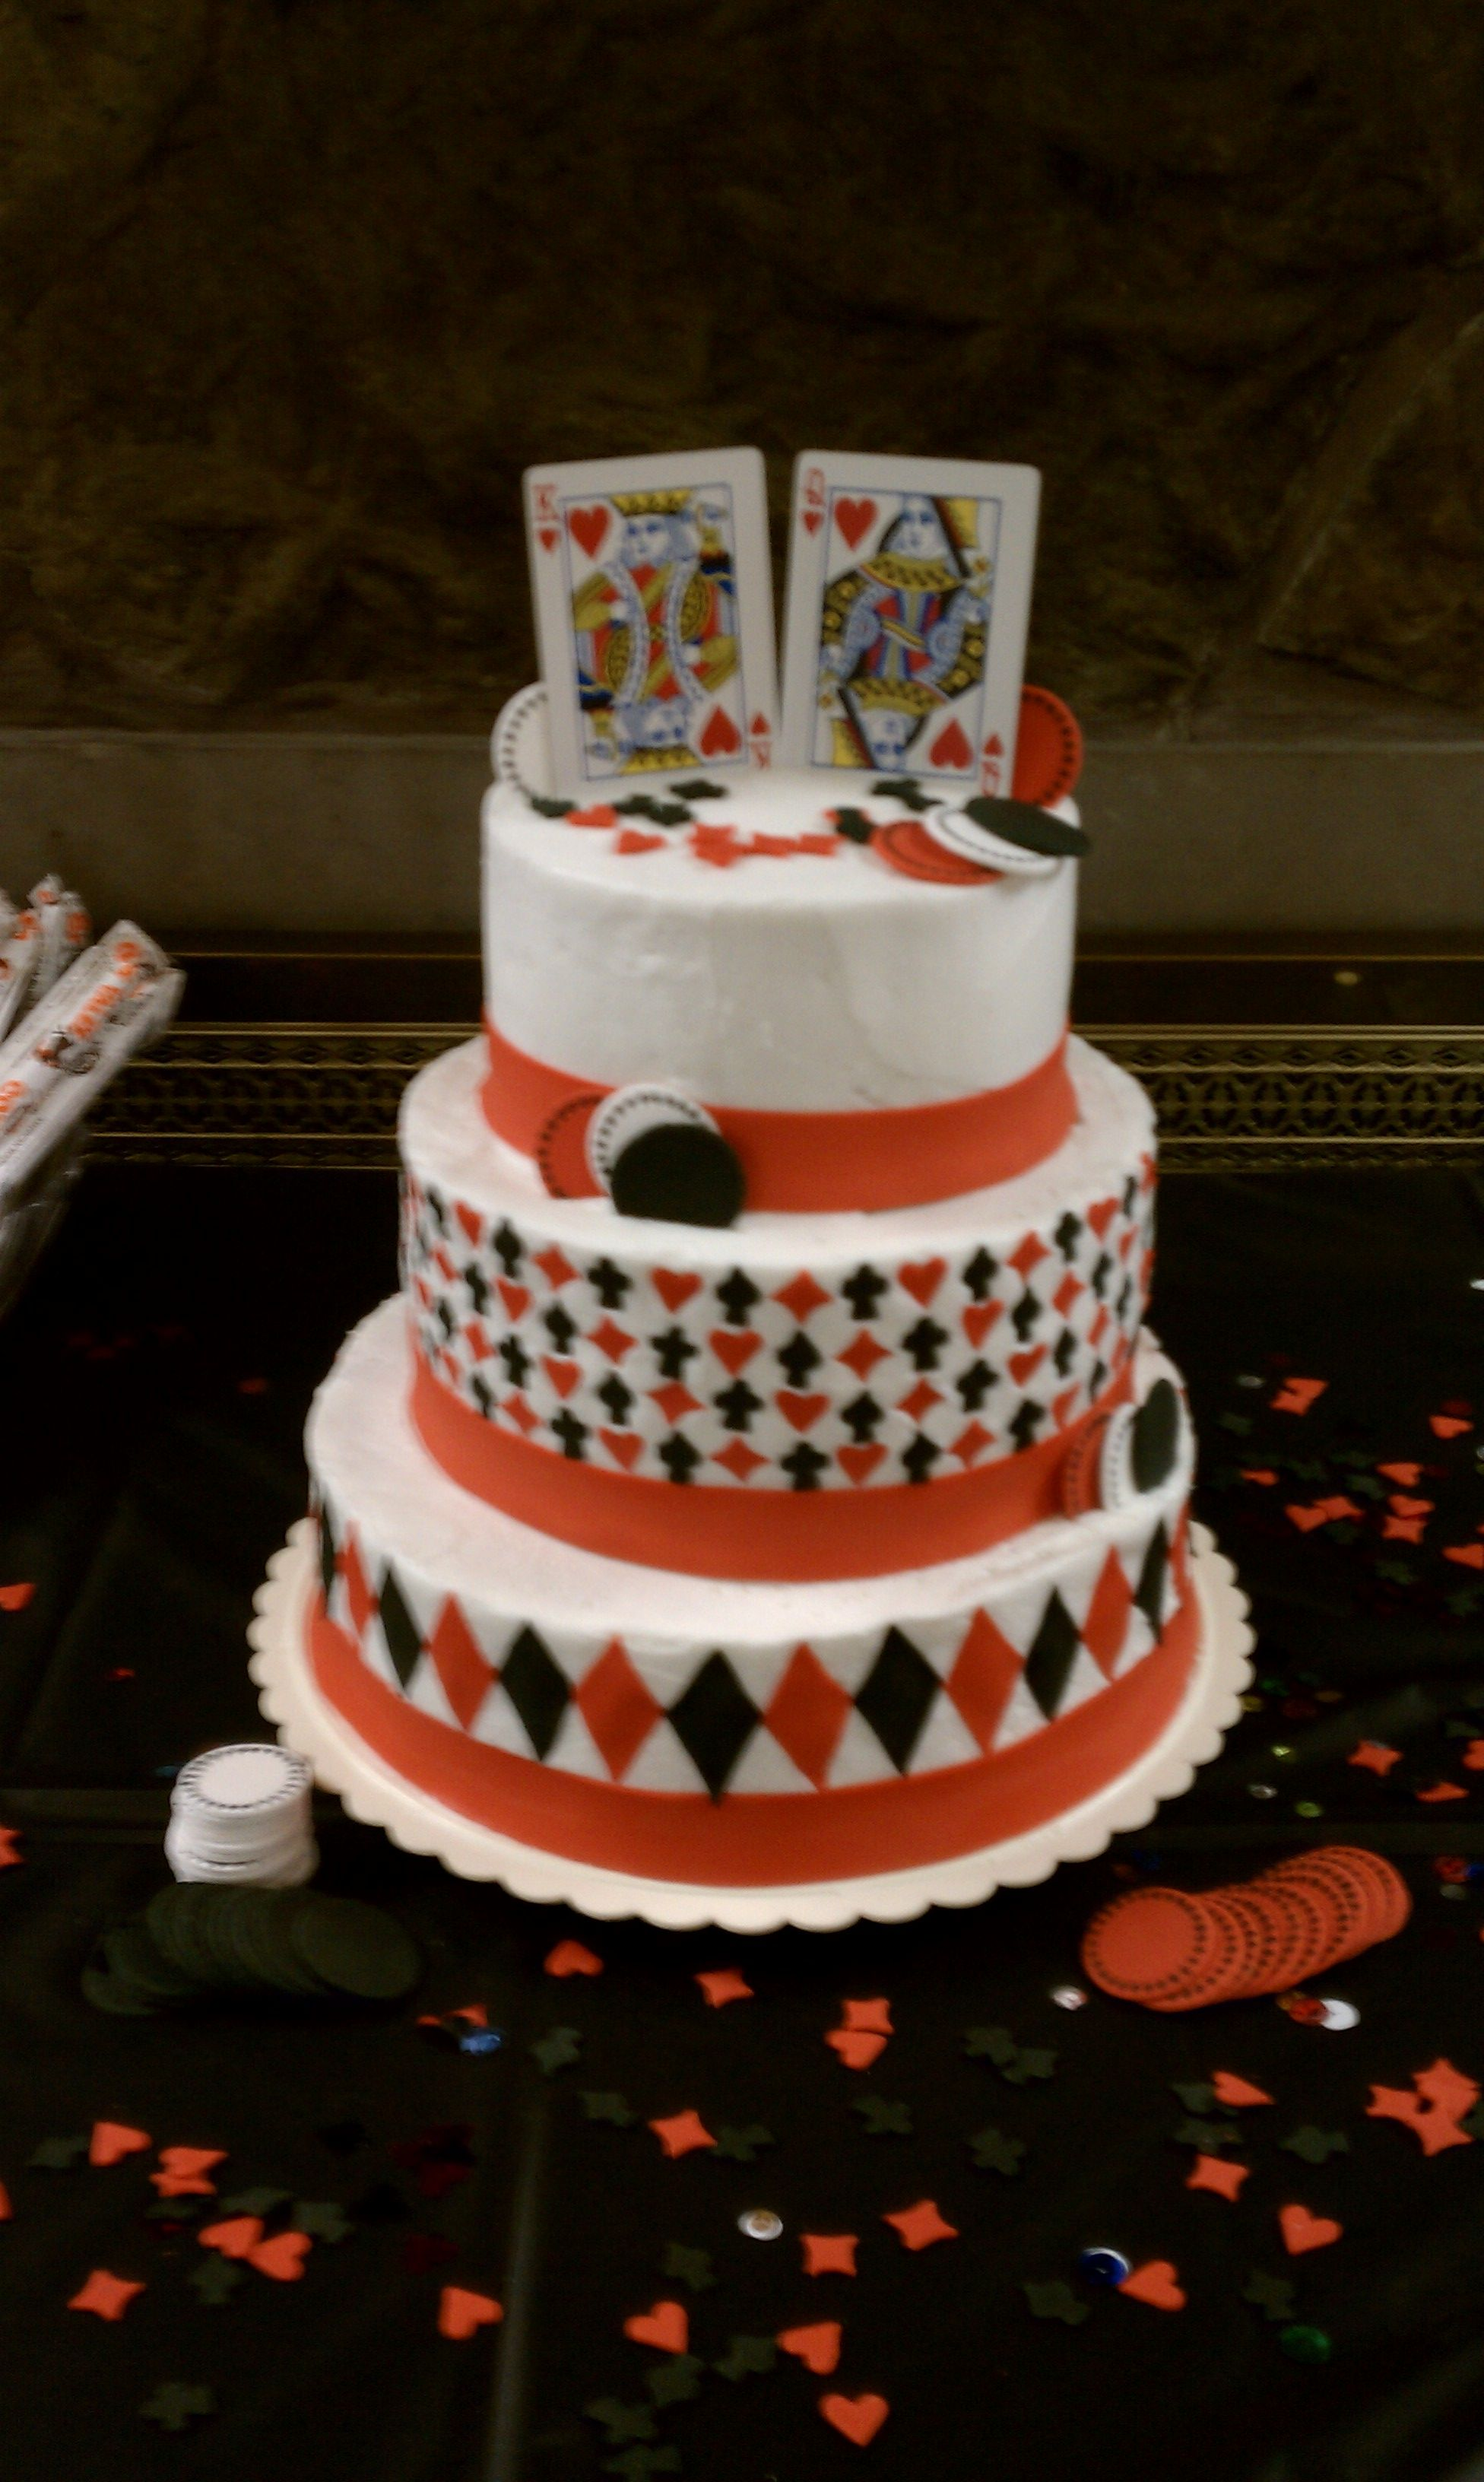 Las vegas wedding cake buttercream base with fondant